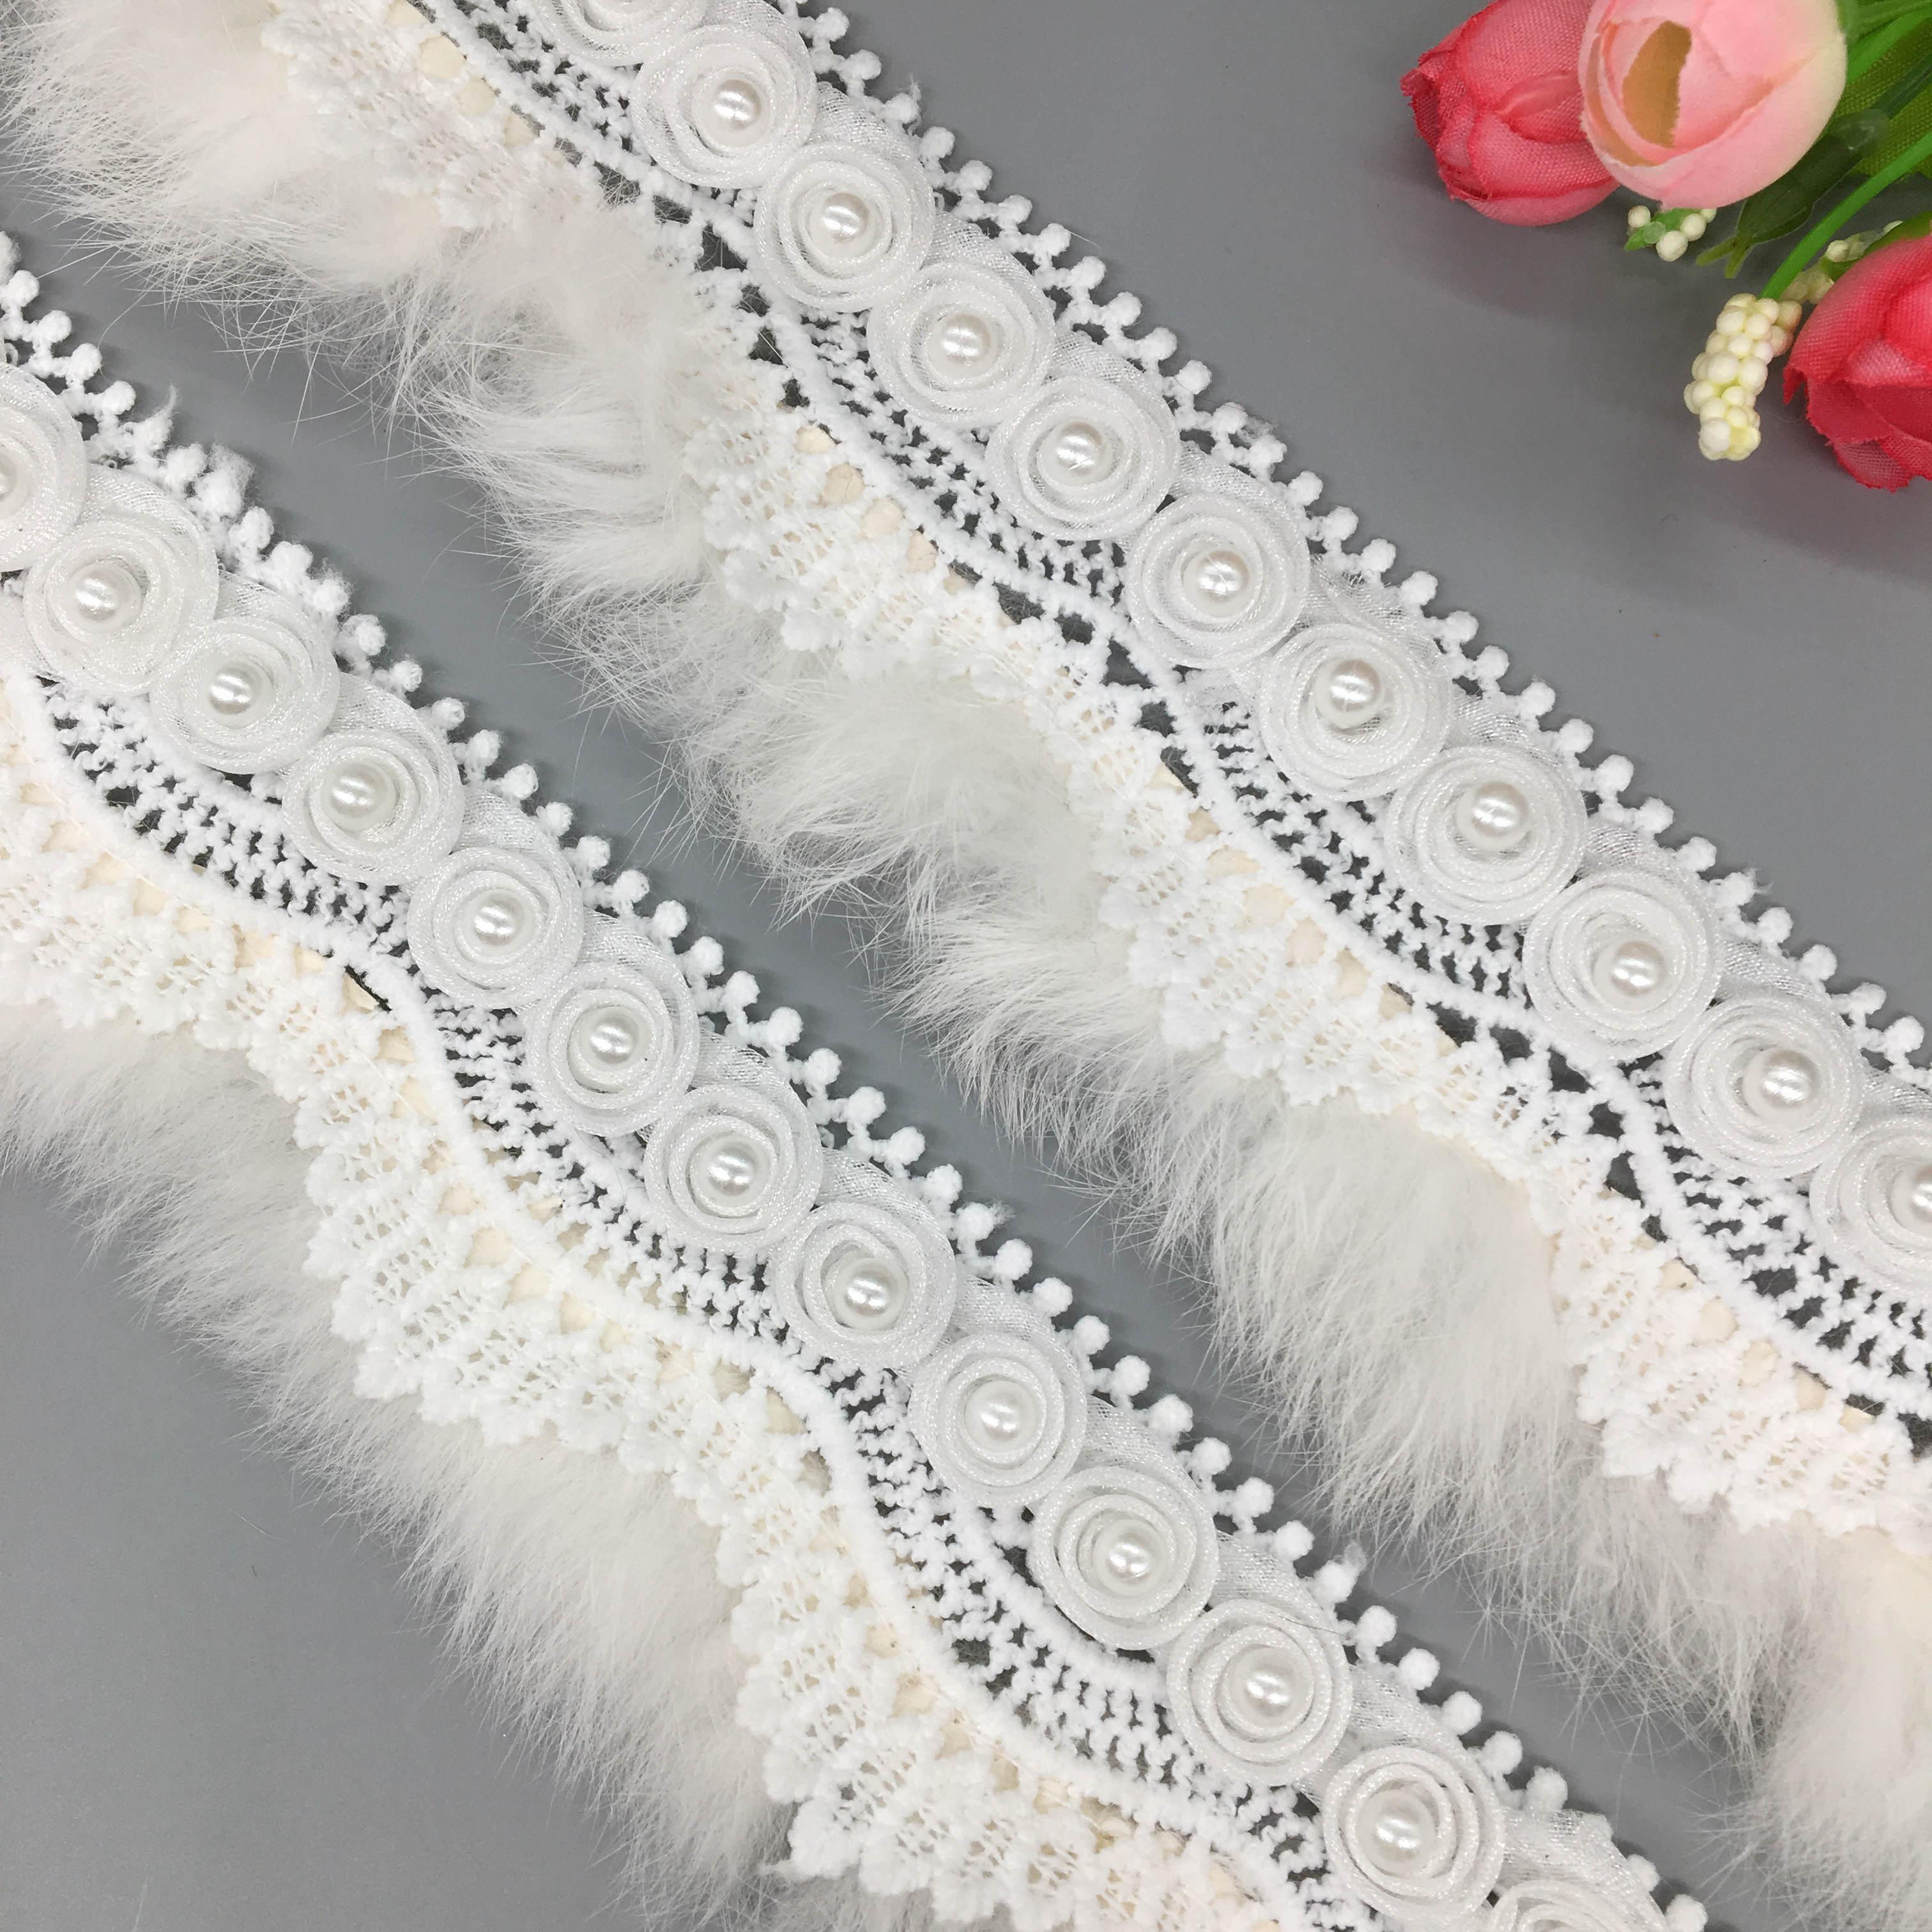 6.5 Cm wide Fancy Sequins Silver Gold Flower Decorate Craft Lace Trim 1 Yard